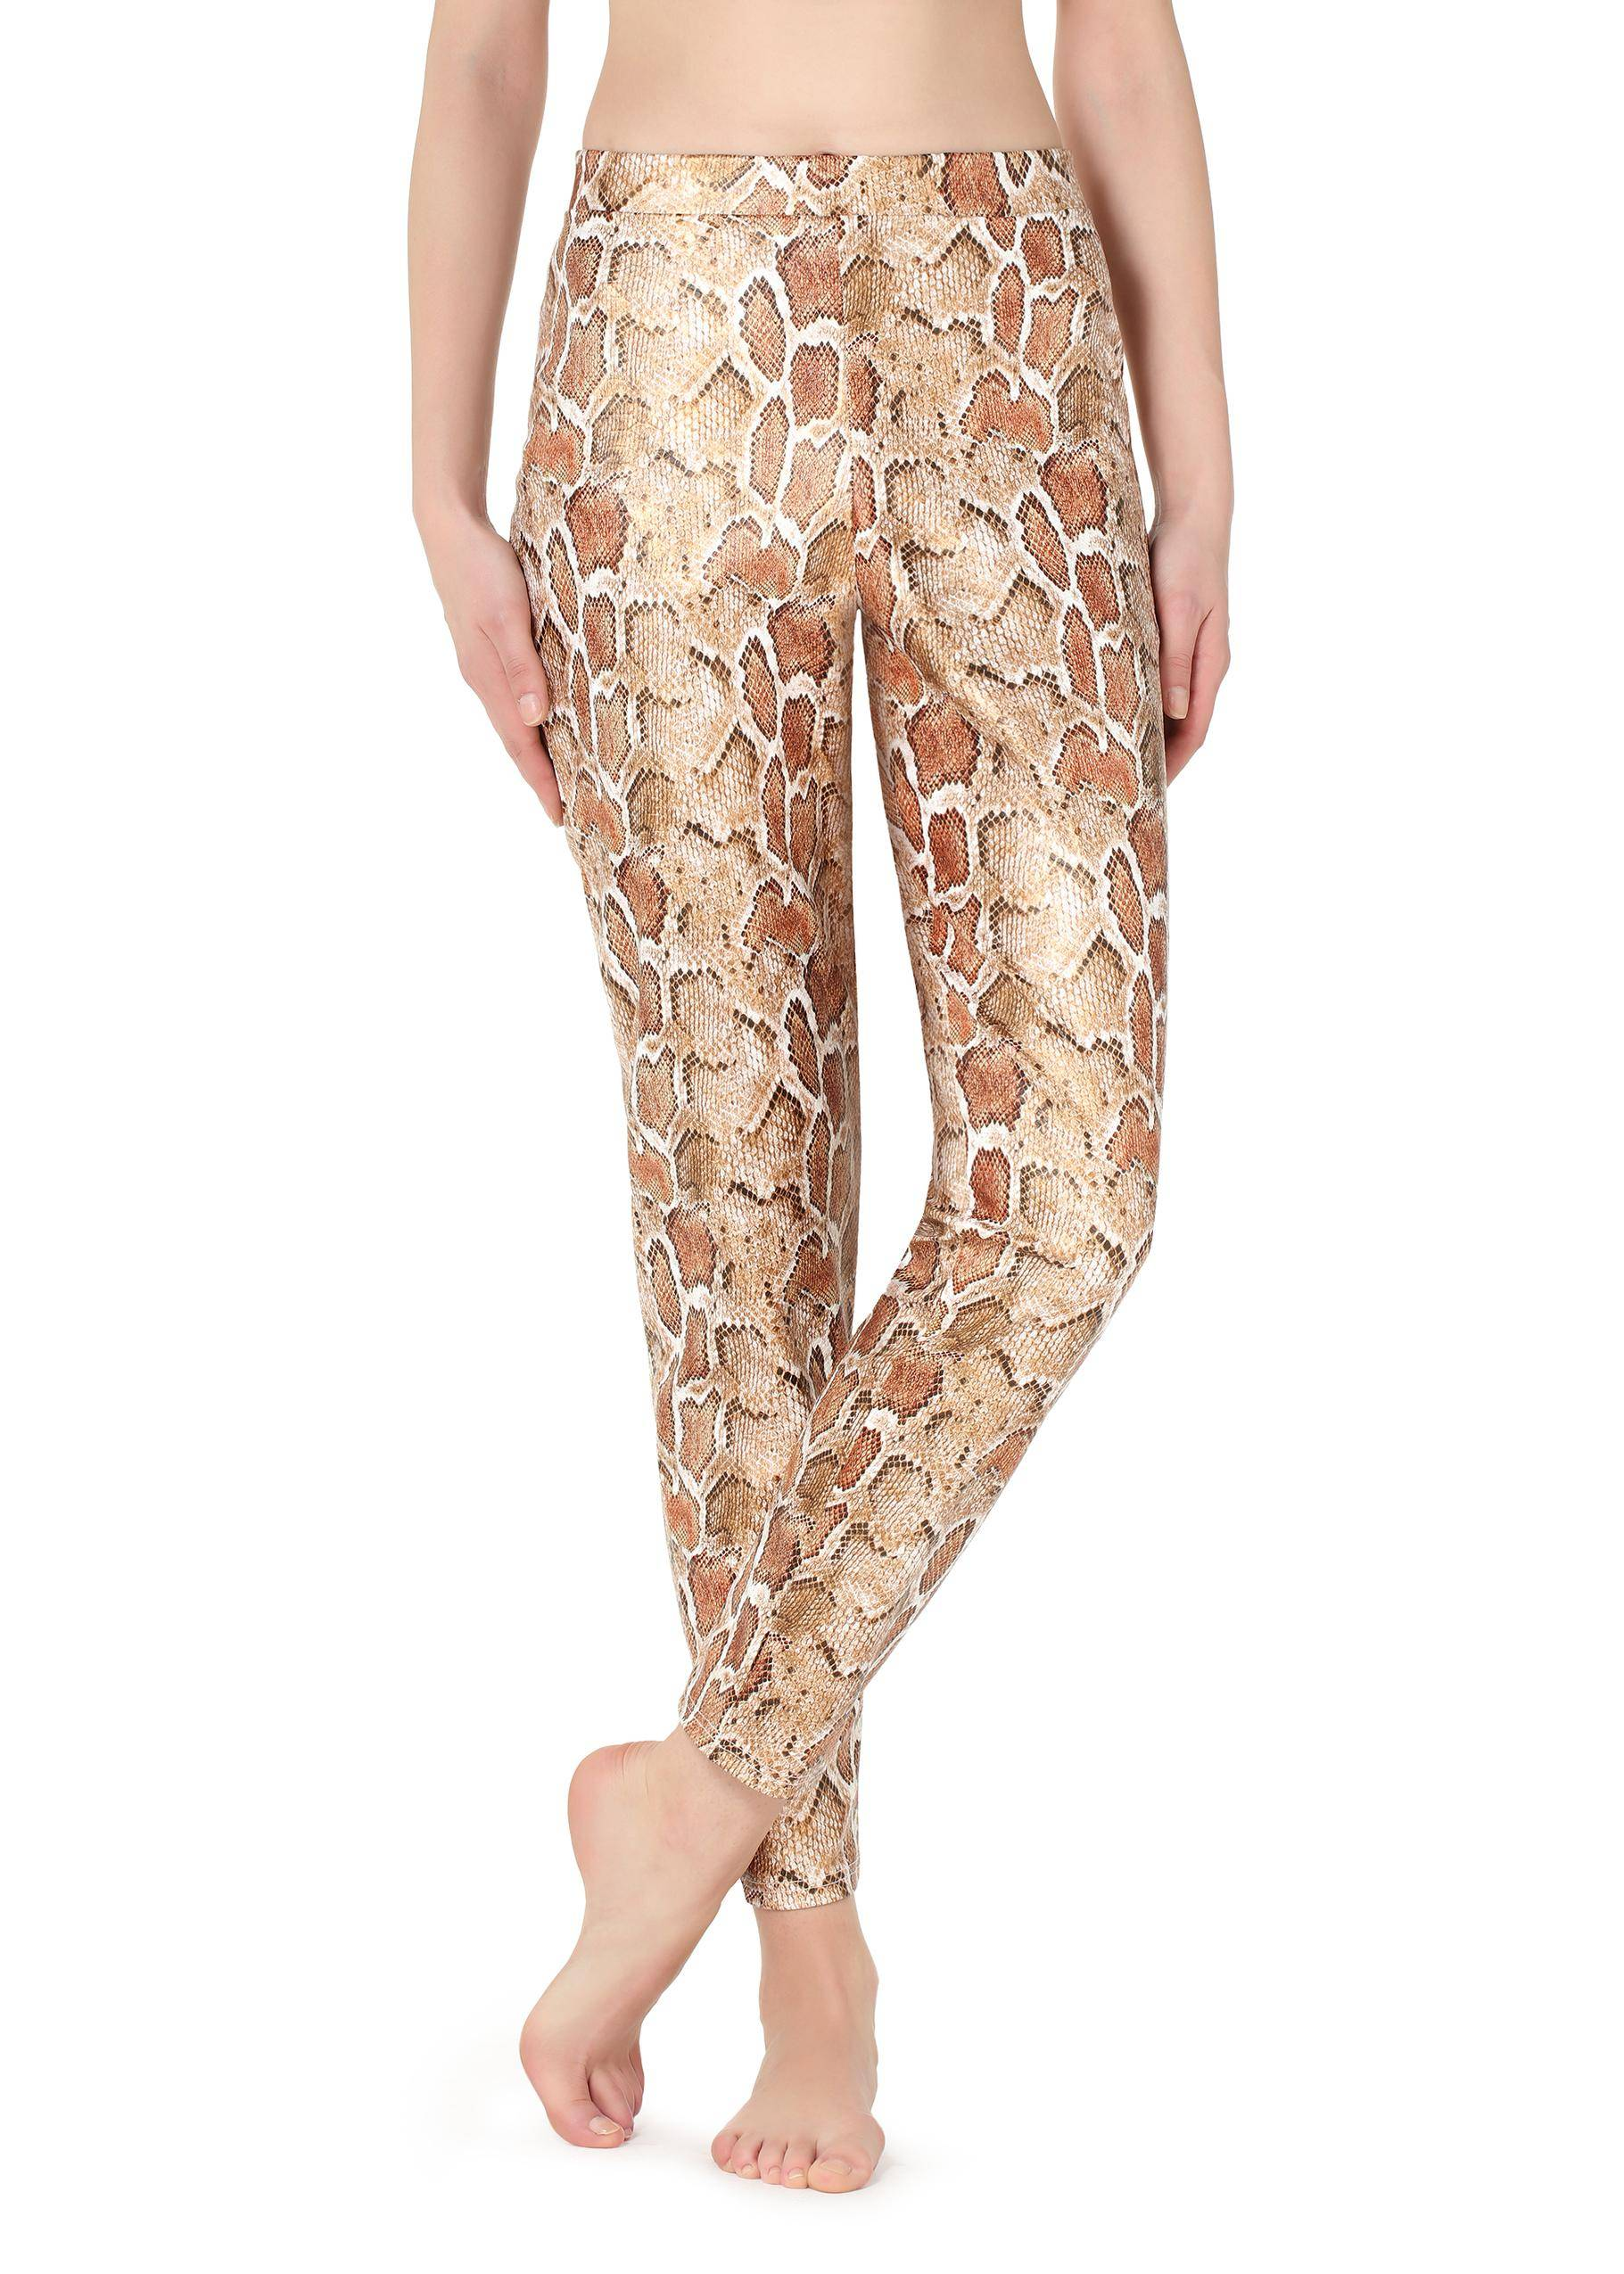 55e5e10c111f33 Calzedonia Snake leather-effect leggings / Red - 1813 - Terracotta / Women